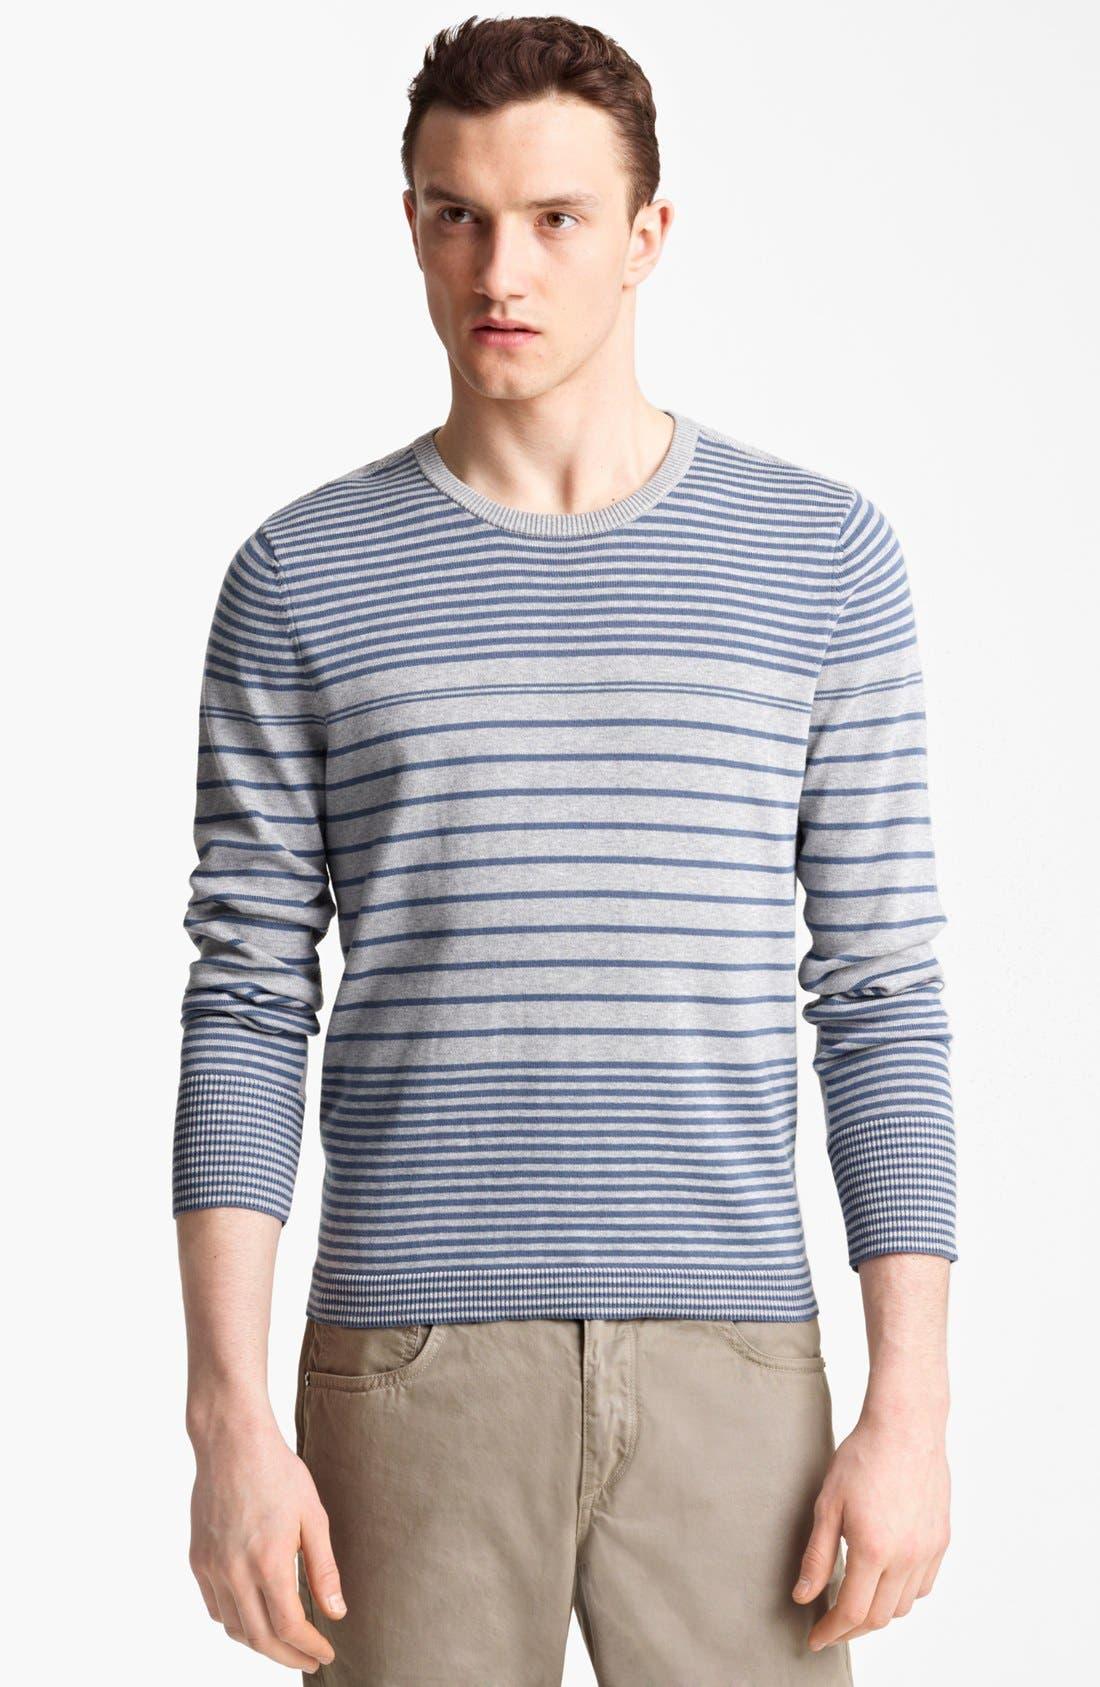 Alternate Image 1 Selected - rag & bone 'Frankie' Crewneck Sweatshirt